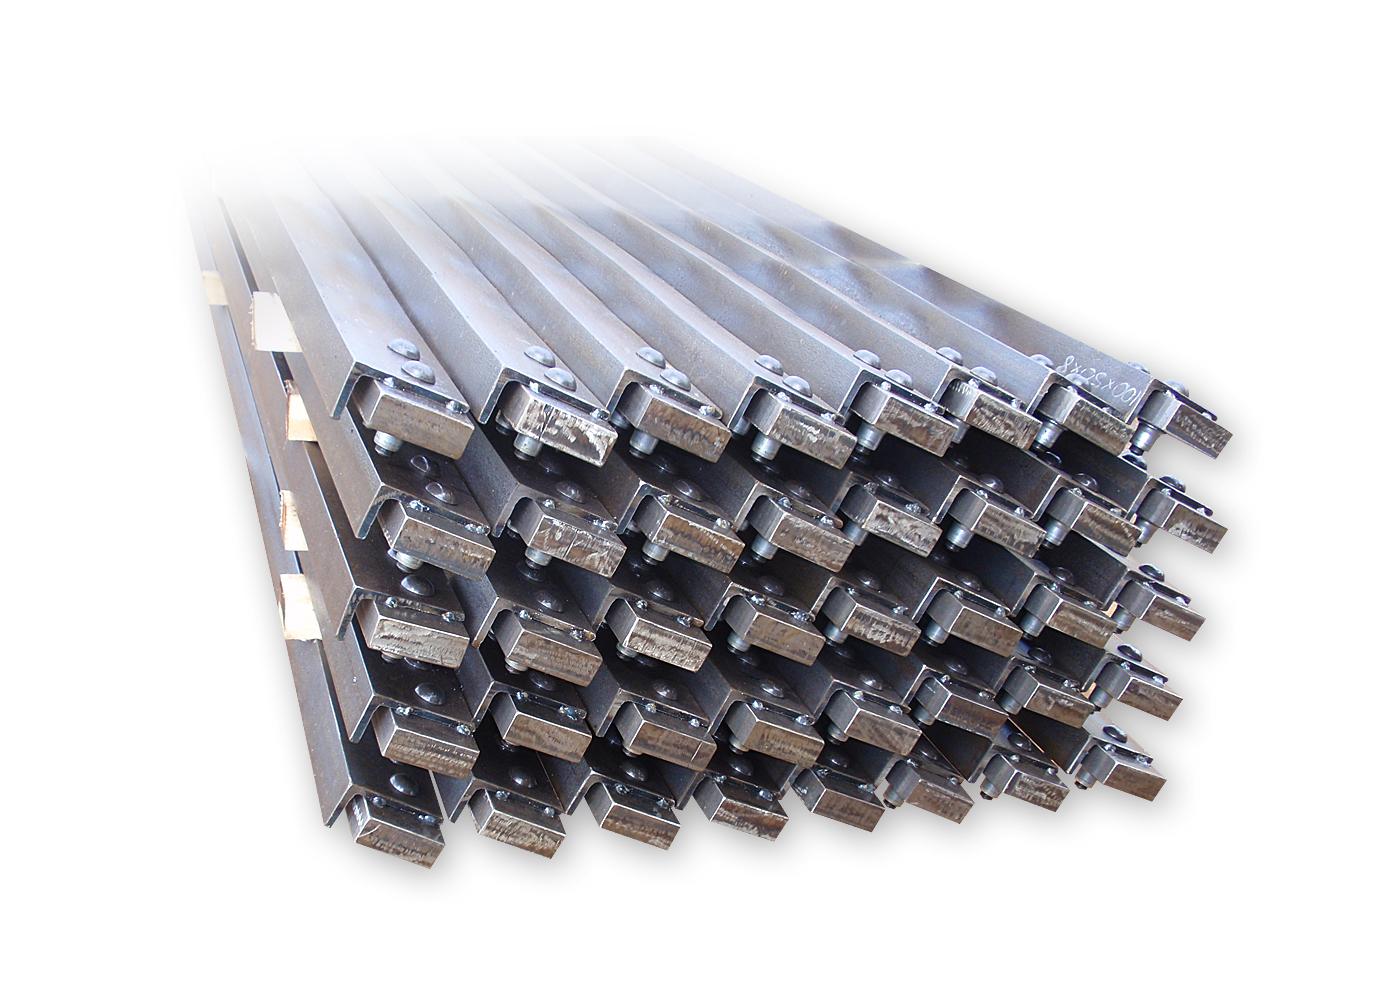 Spare parts for electrostatic percipitators